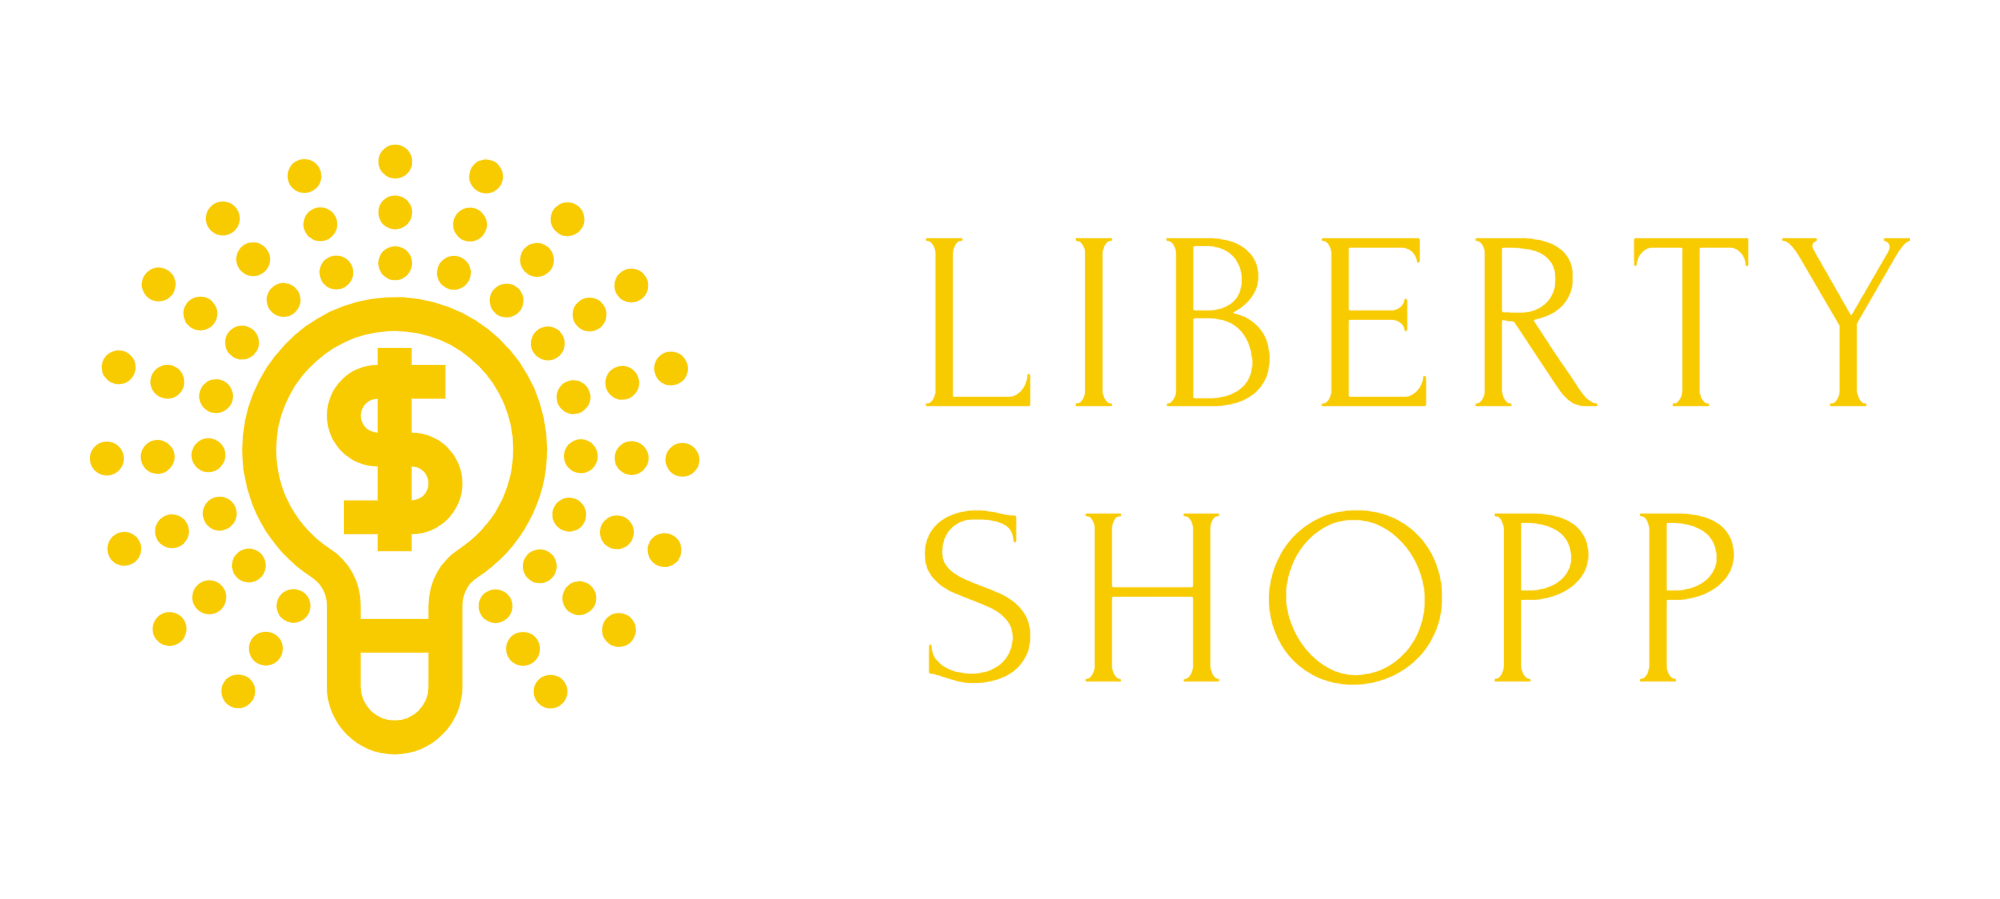 Liberty Shopp